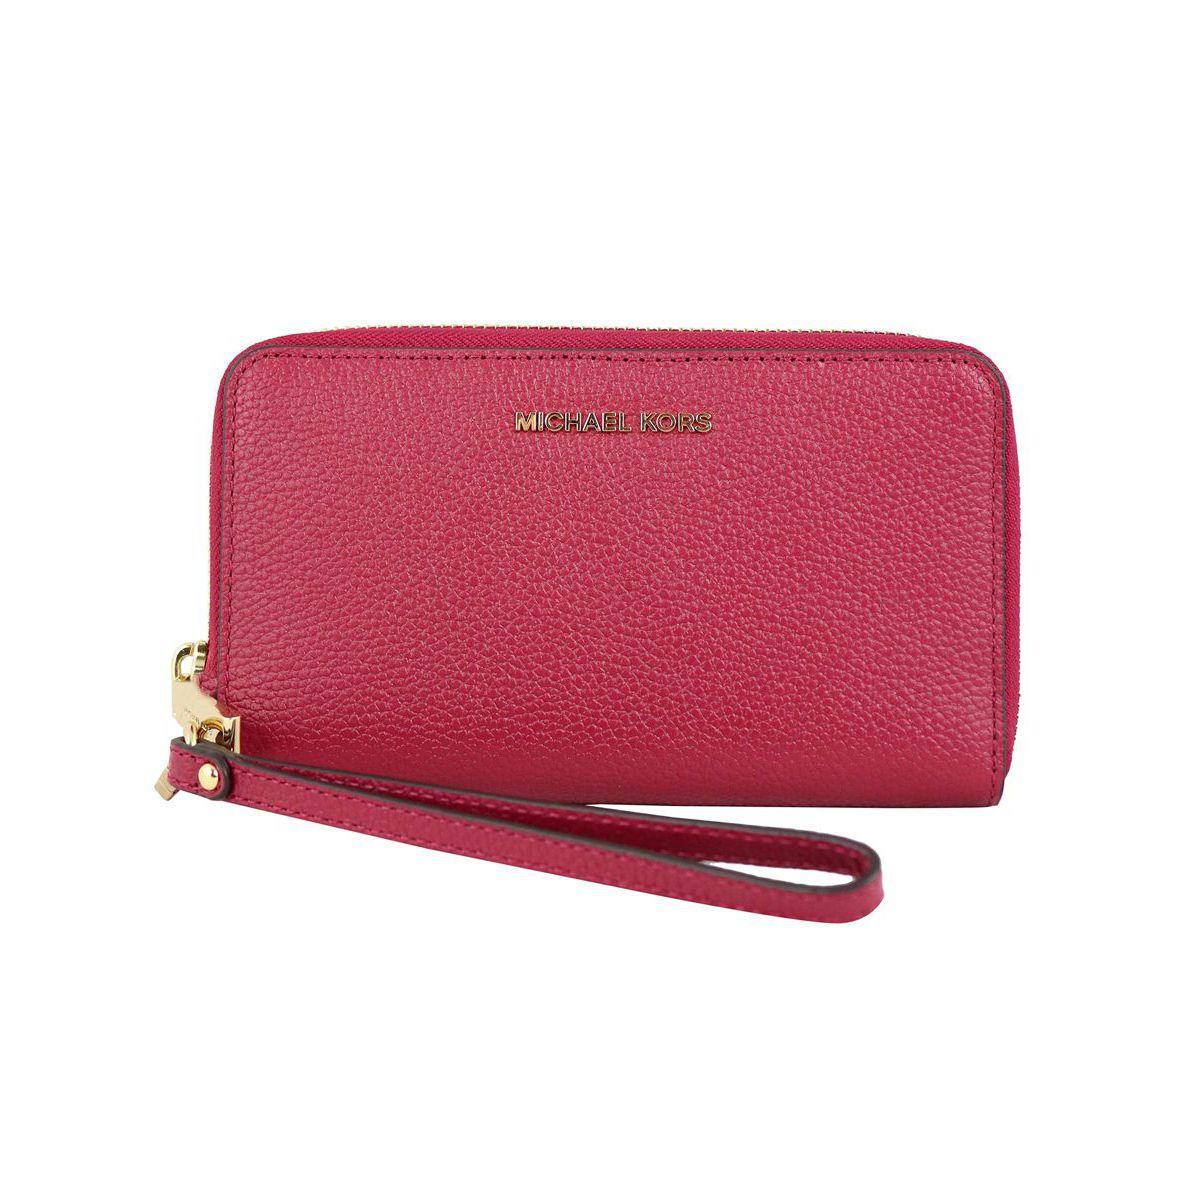 Wallet with bracelet and inside pocket for smartphones Cherry Michael Kors